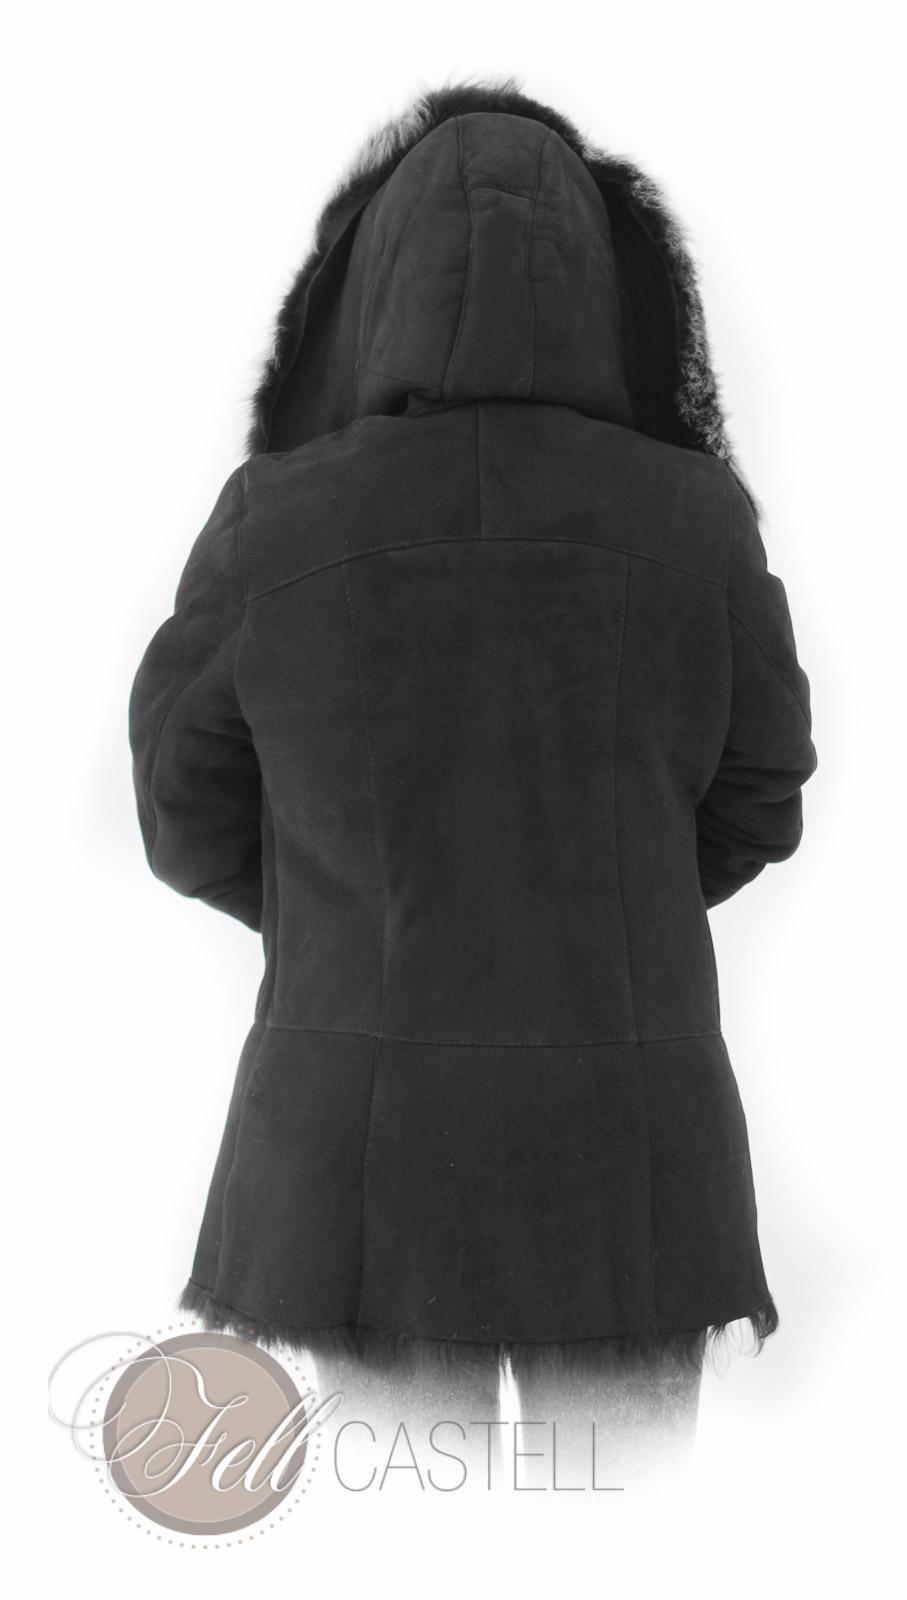 Lammfelljacke Damen Gr. 38 Schwarz Toscana Lammfell Kapuzenjacke